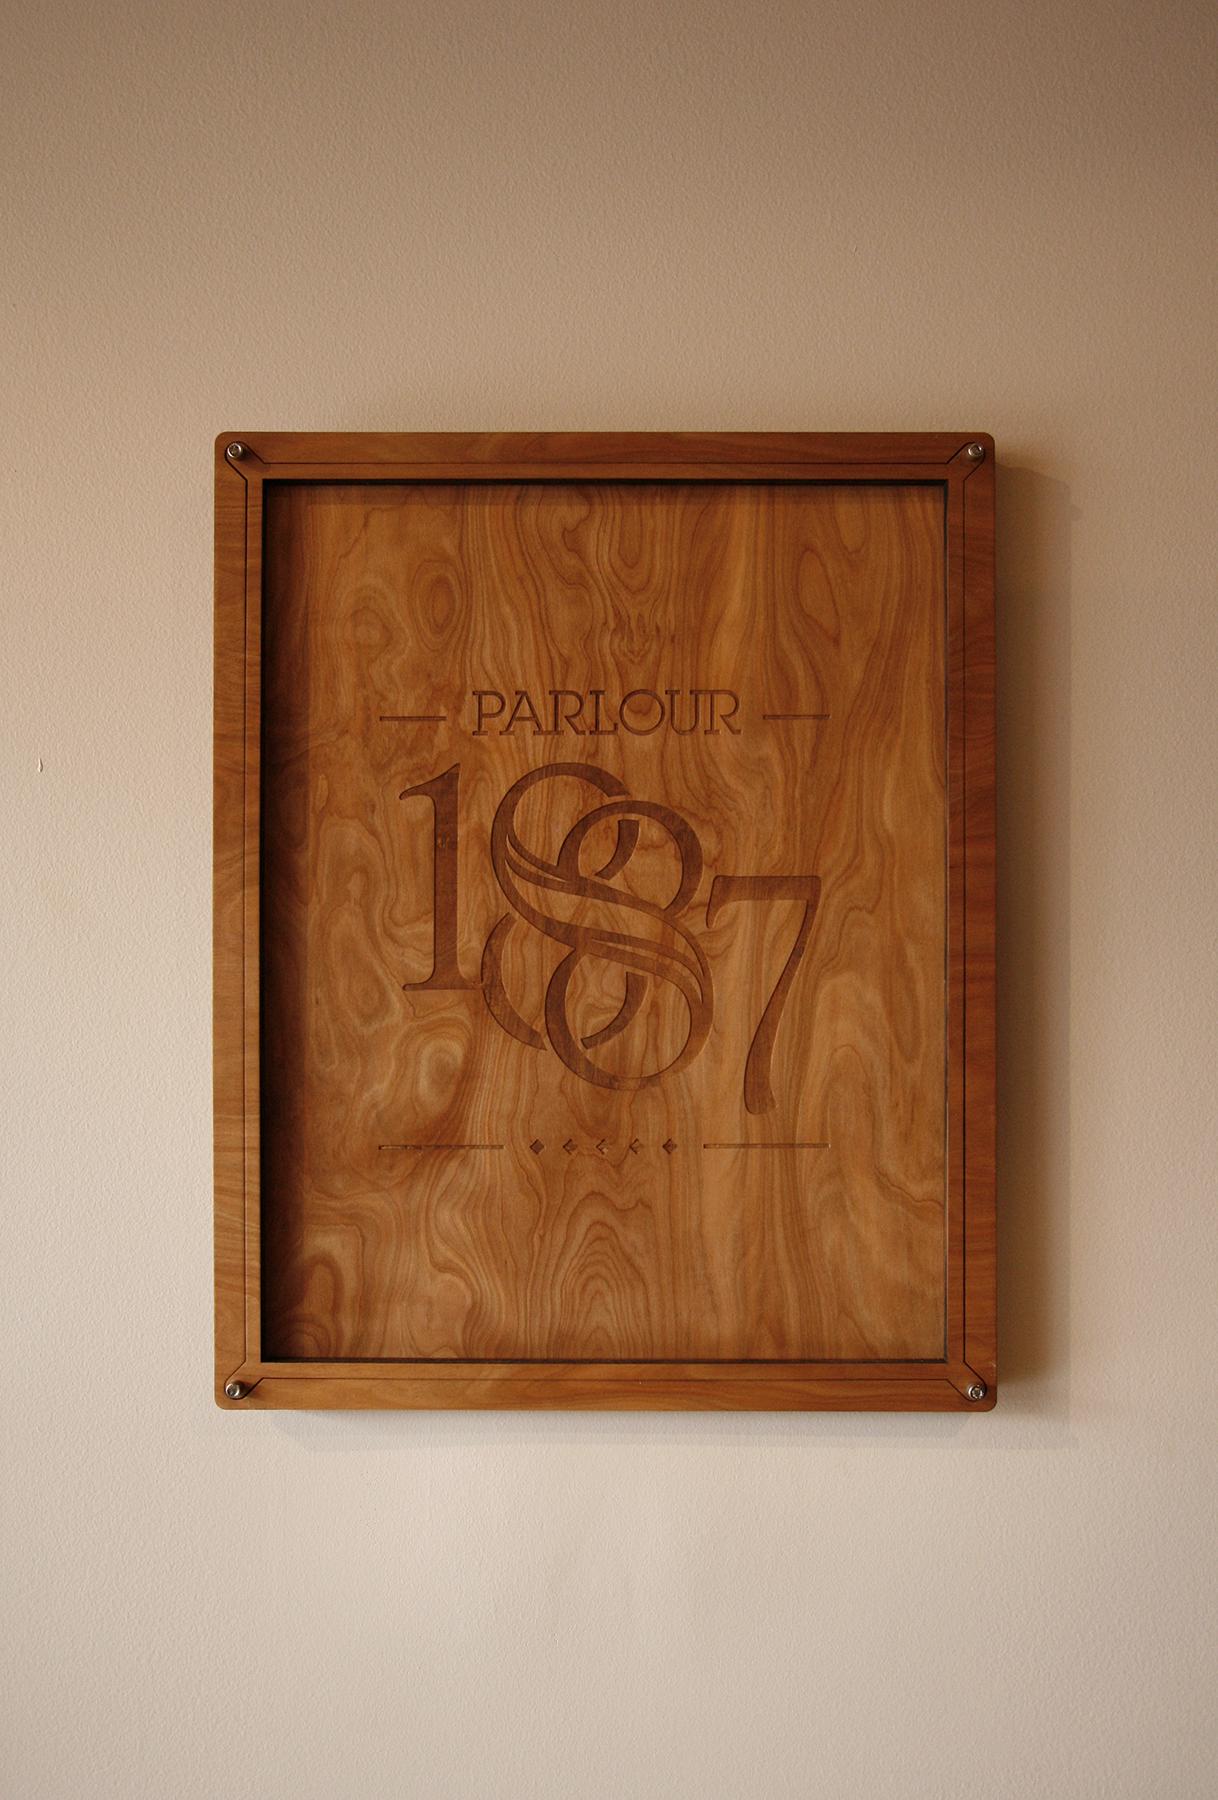 Parlour Frames 02.jpg